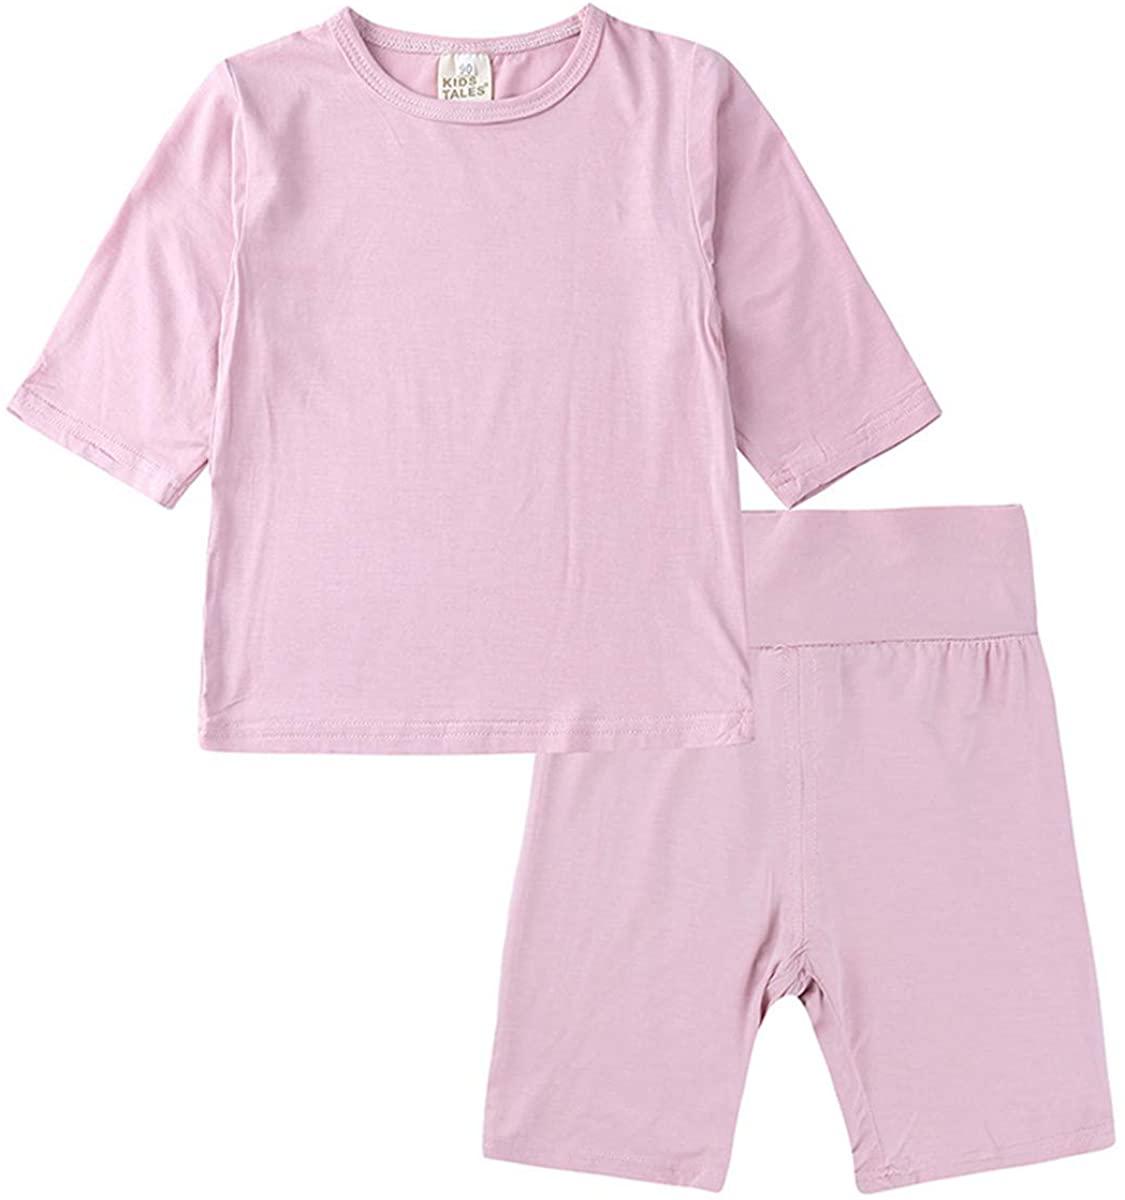 Little Kids Boys Girls 2 Pack Soild Soft Modal Cotton 3/4 Sleeve Summer Spring Pajamas Homewear Set Sleepwear